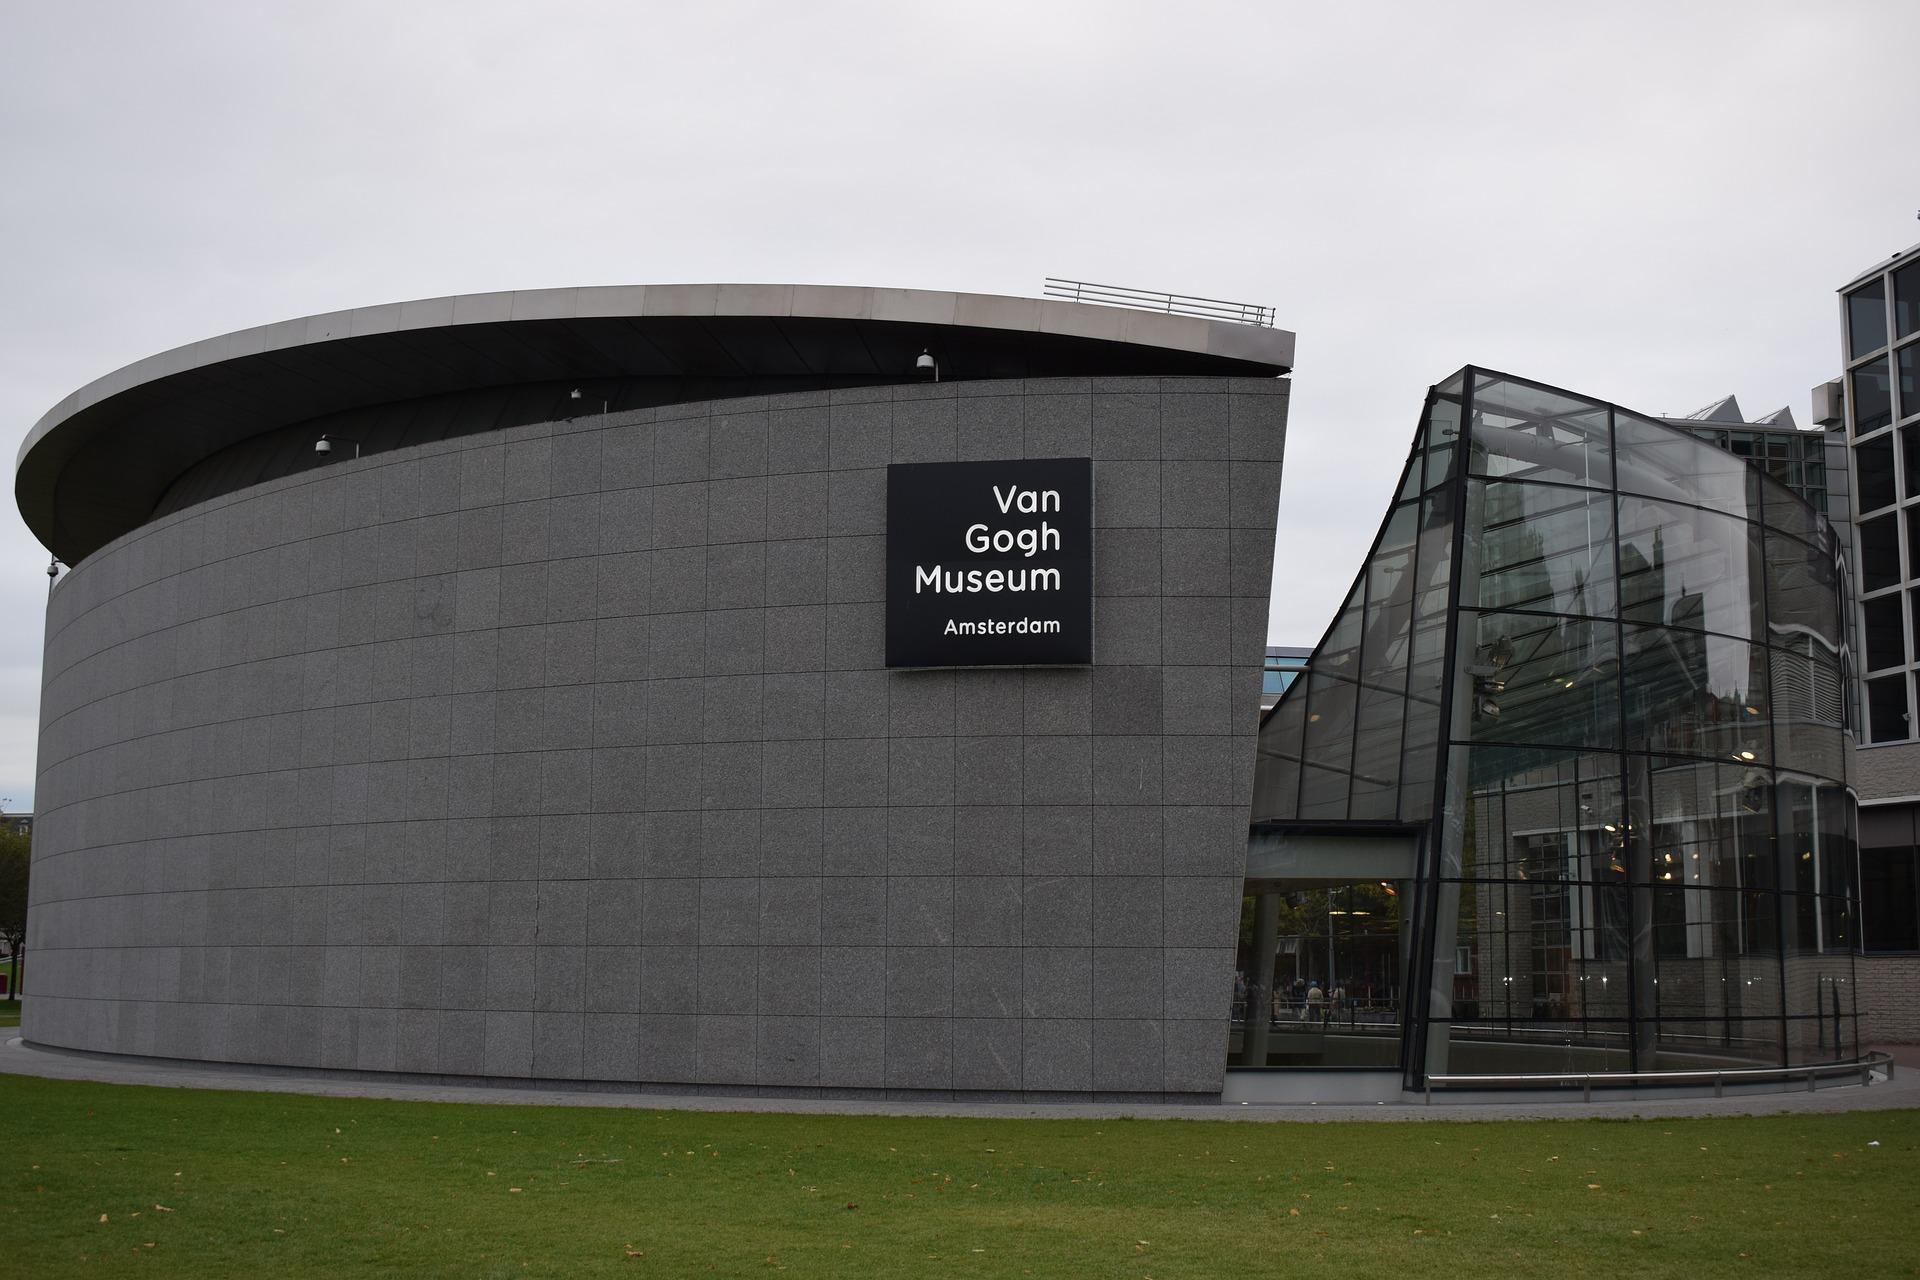 Van Gogh Museum - Amsterdam